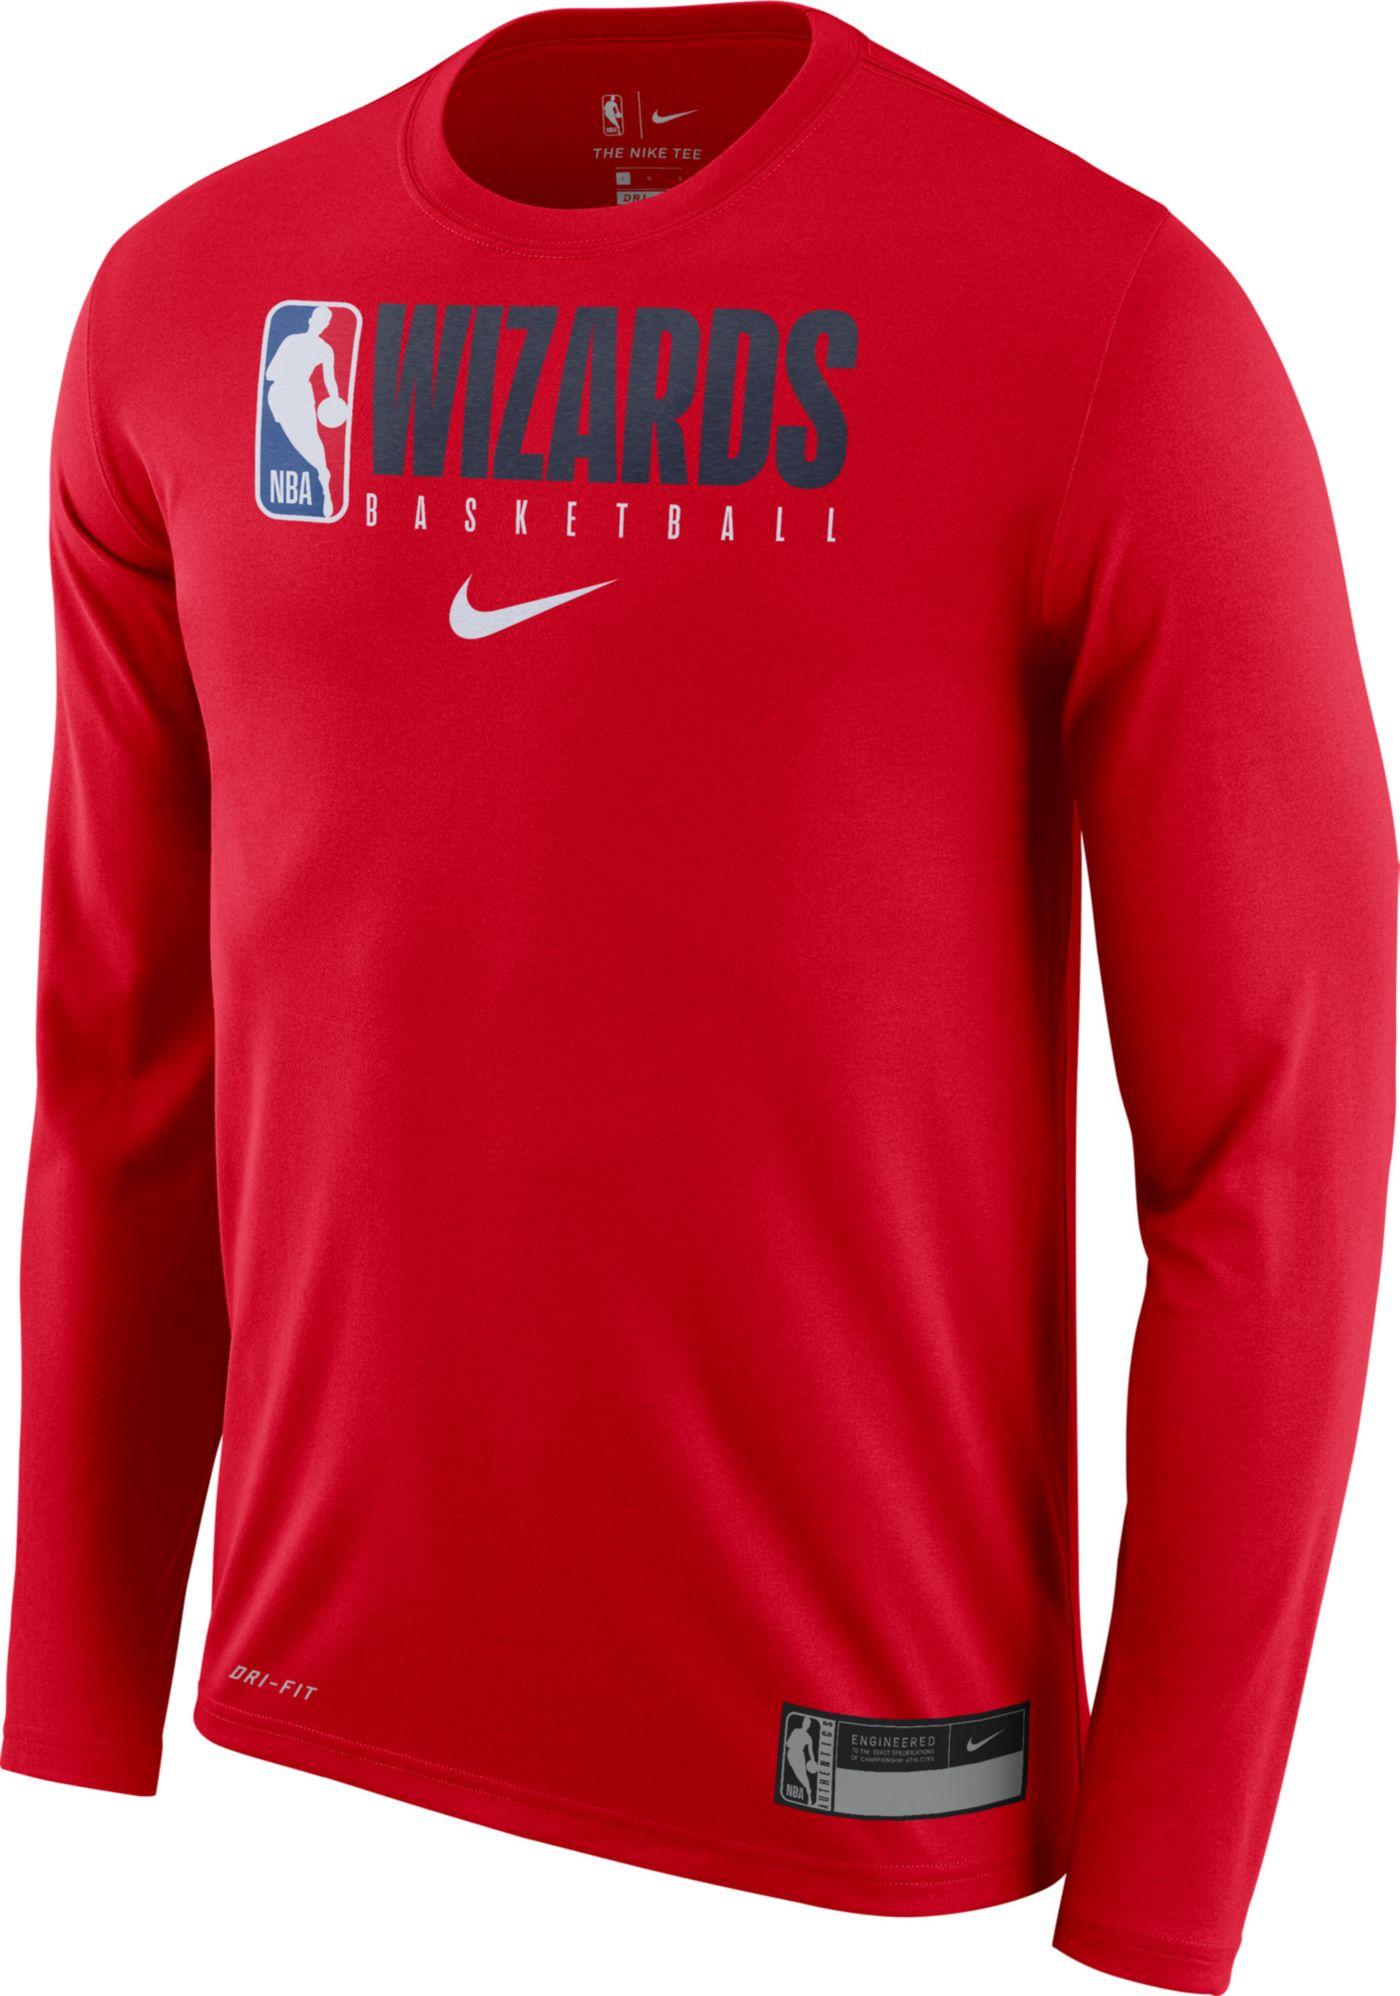 Nike Men's Washington Wizards Dri-FIT Practice Long Sleeve Shirt